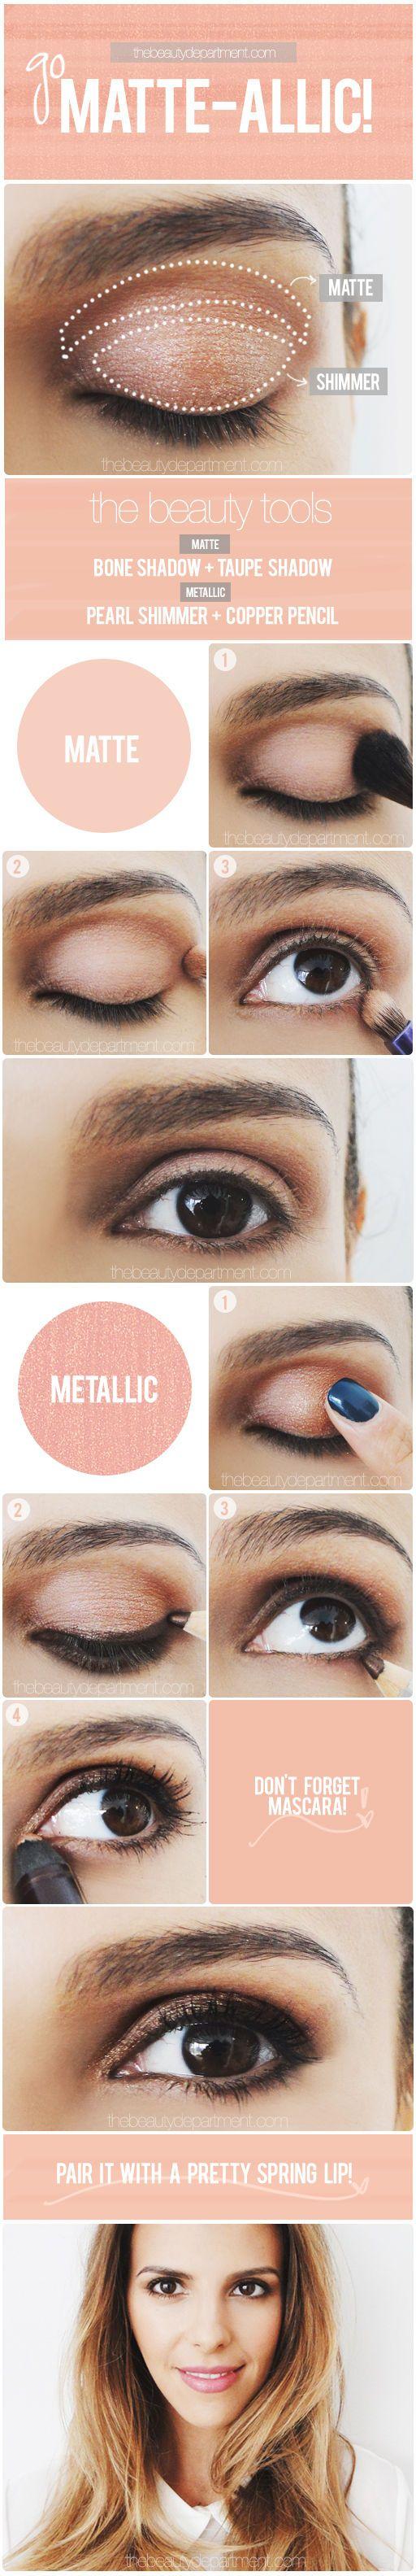 How to balance matte & metallic shadows!